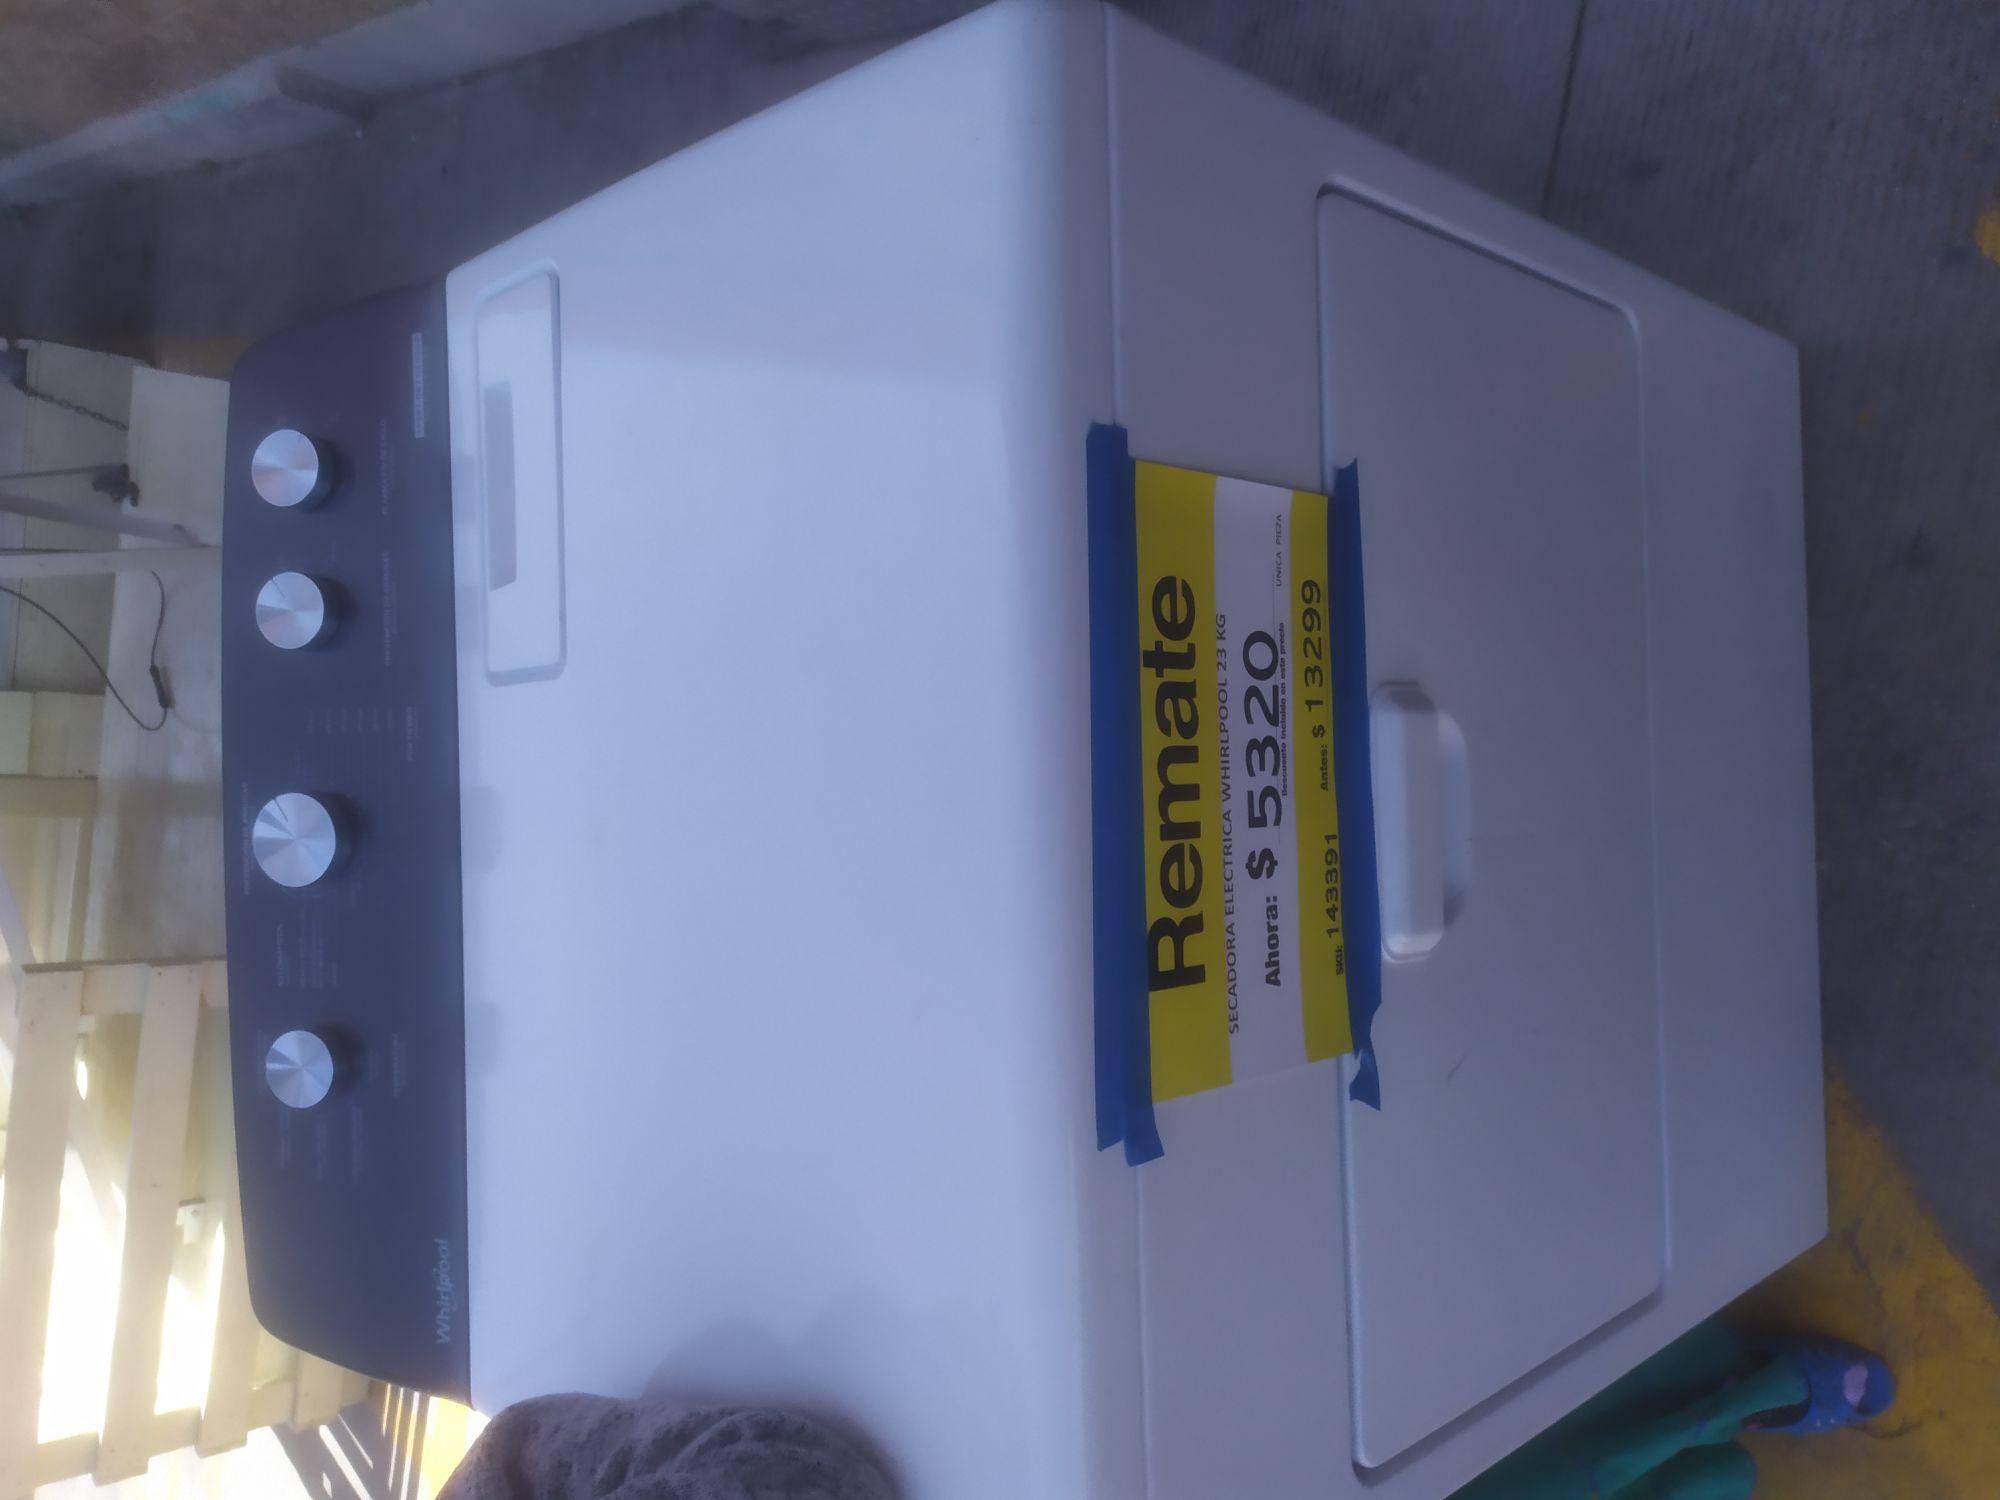 Home depot: Secadora eléctrica Whirlpool 23kg